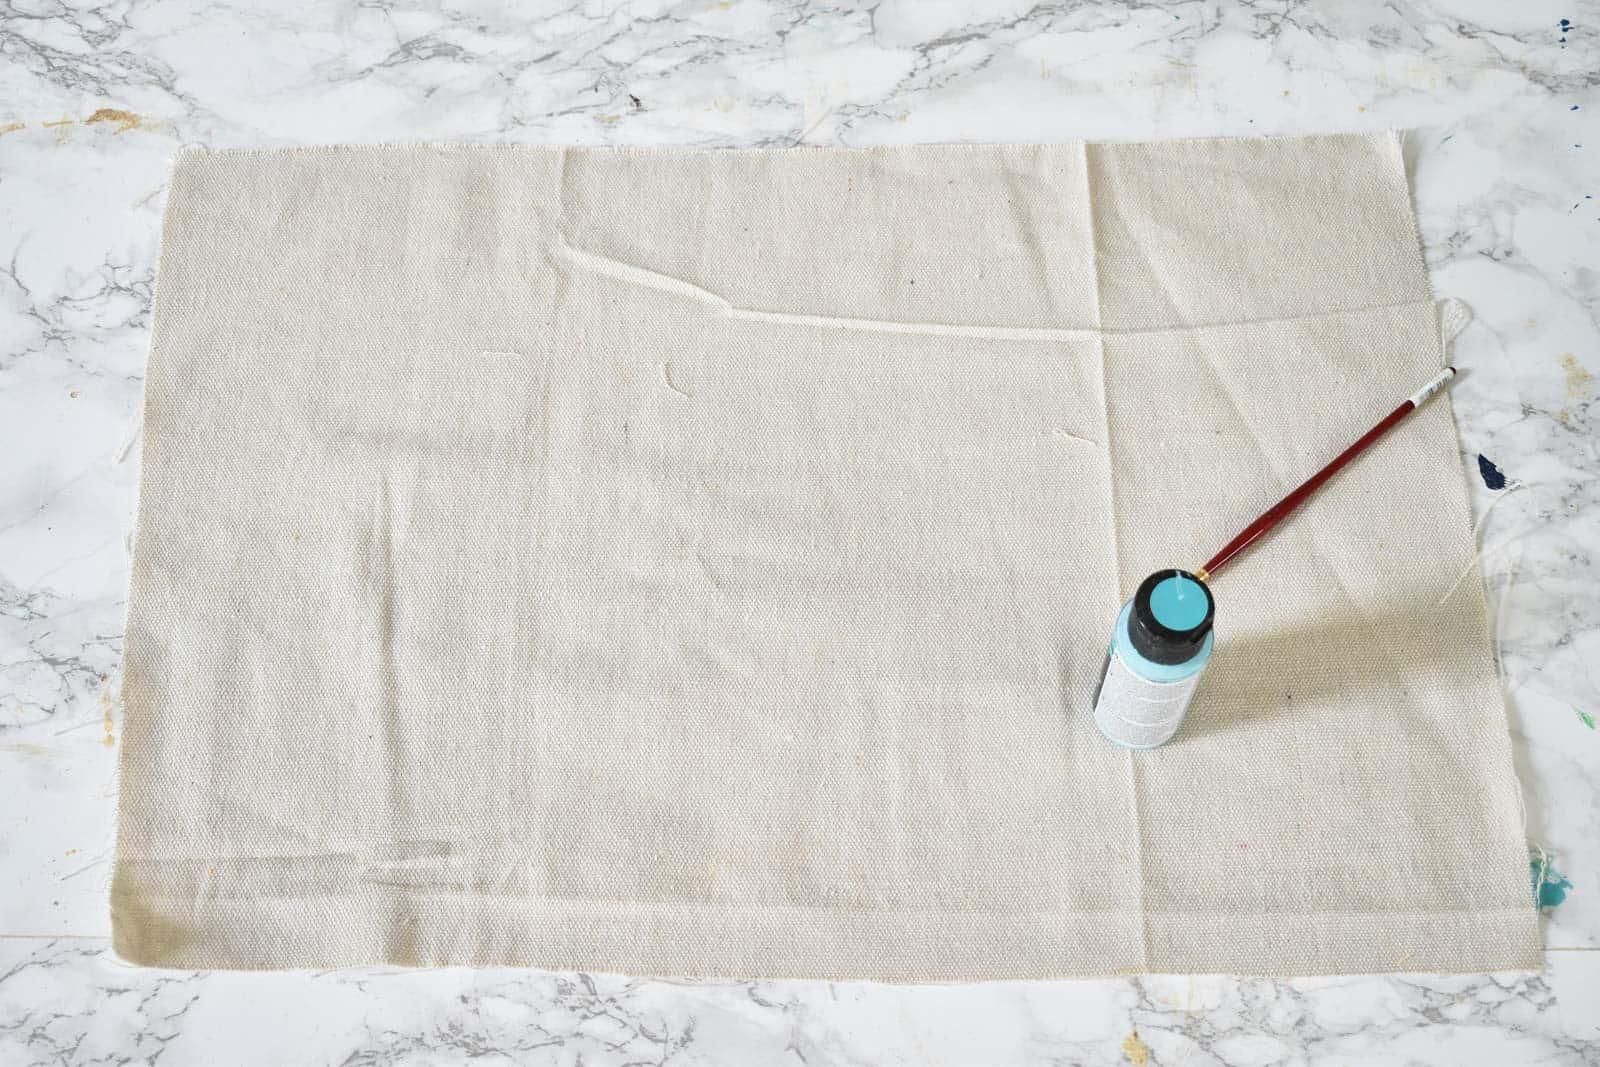 Cut dropcloth to size